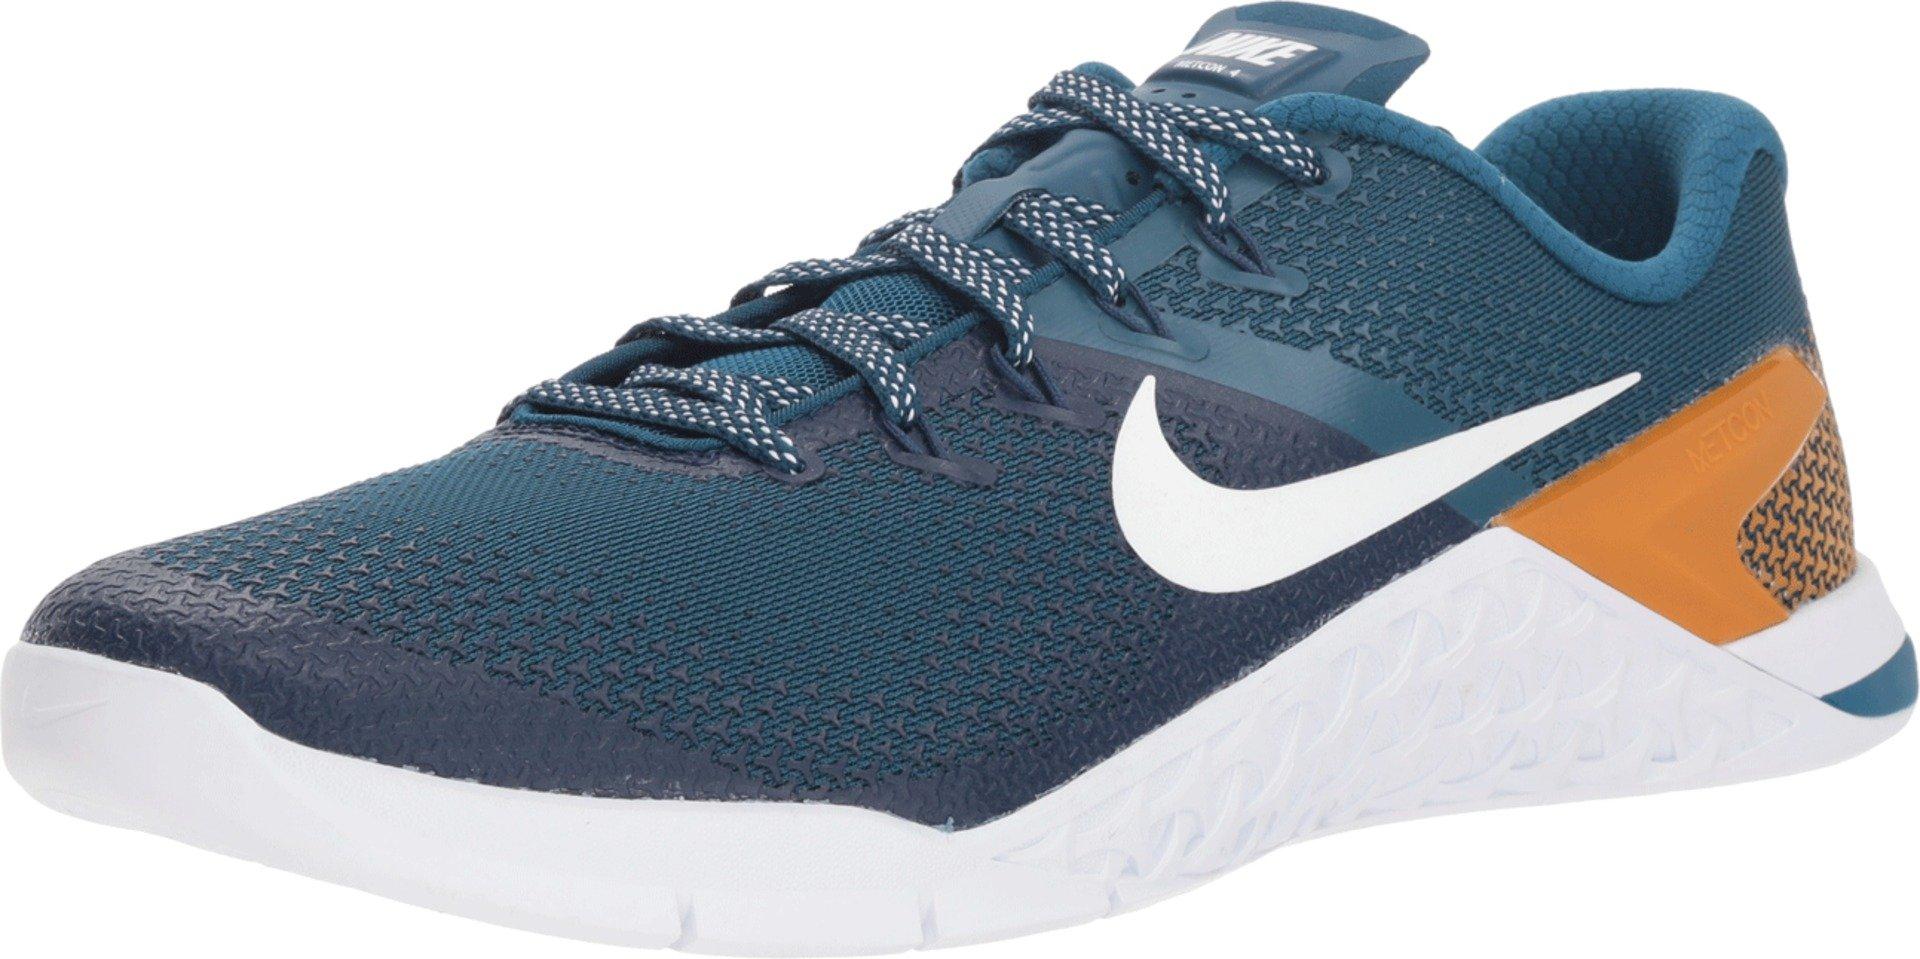 Nike Metcon 4 Mens Ah7453-400 Size 11